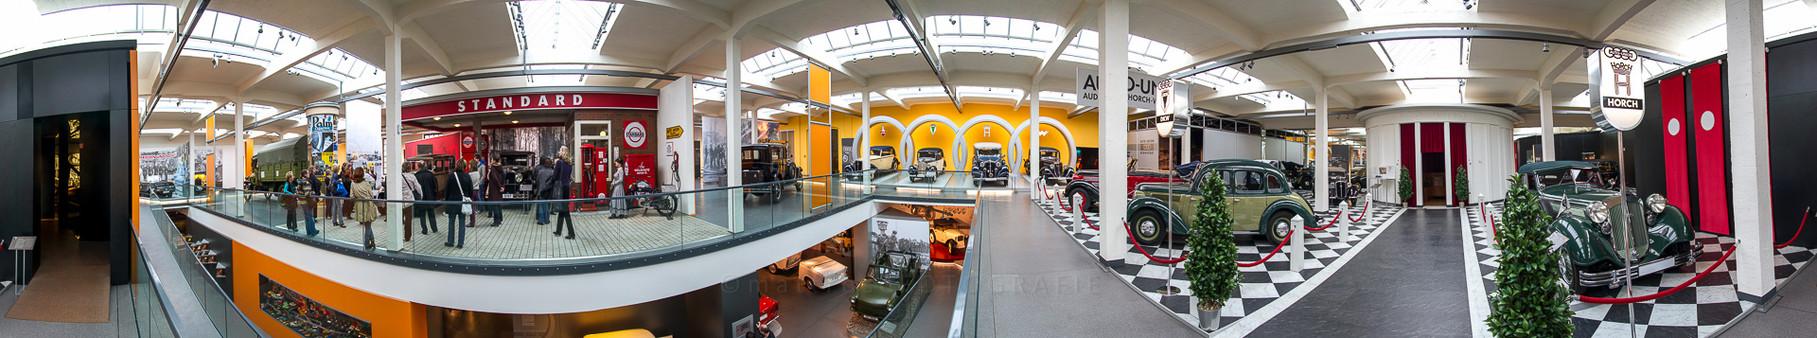 August-Horch-Museum Zwickau